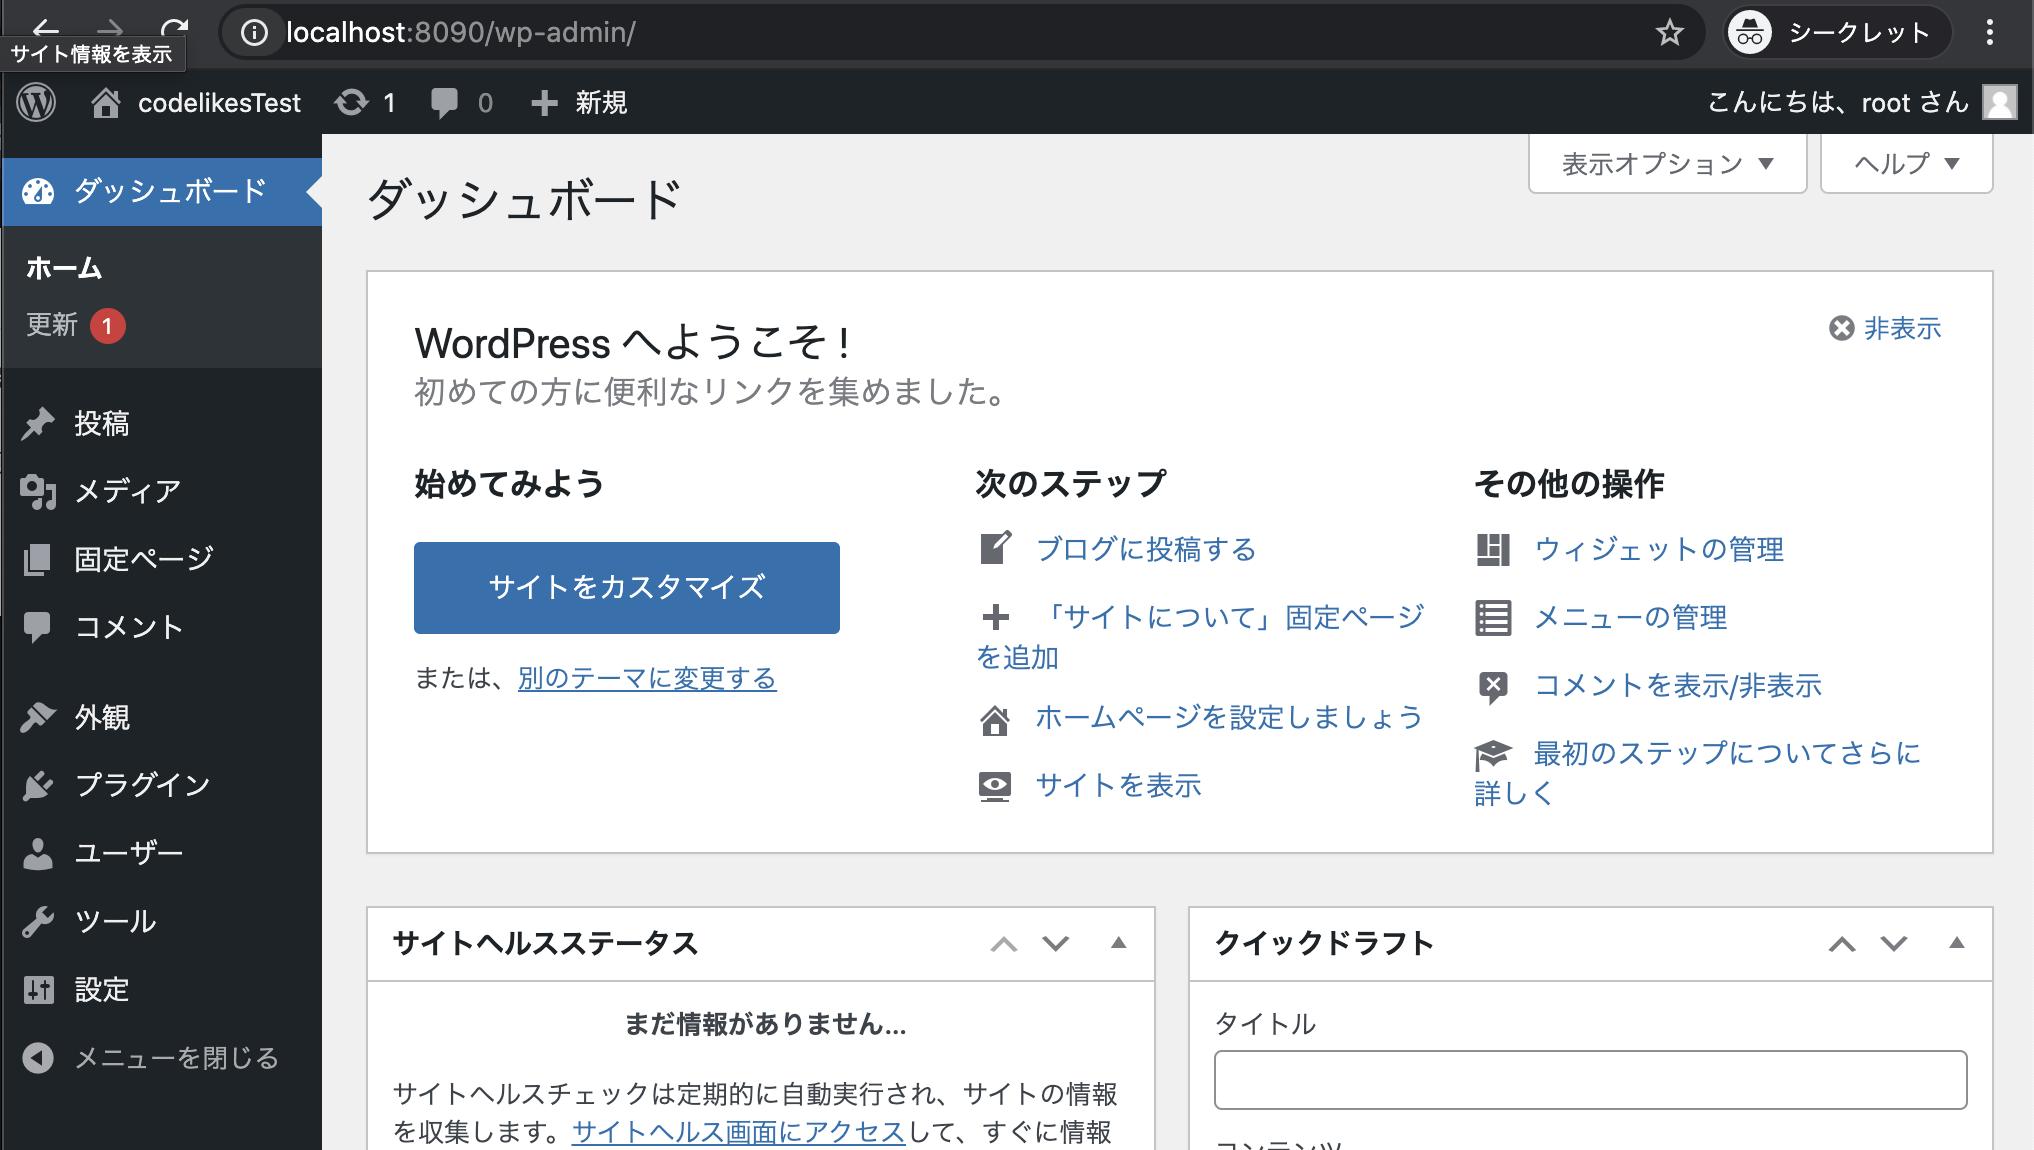 Dockerで作成したWordpressにログイン